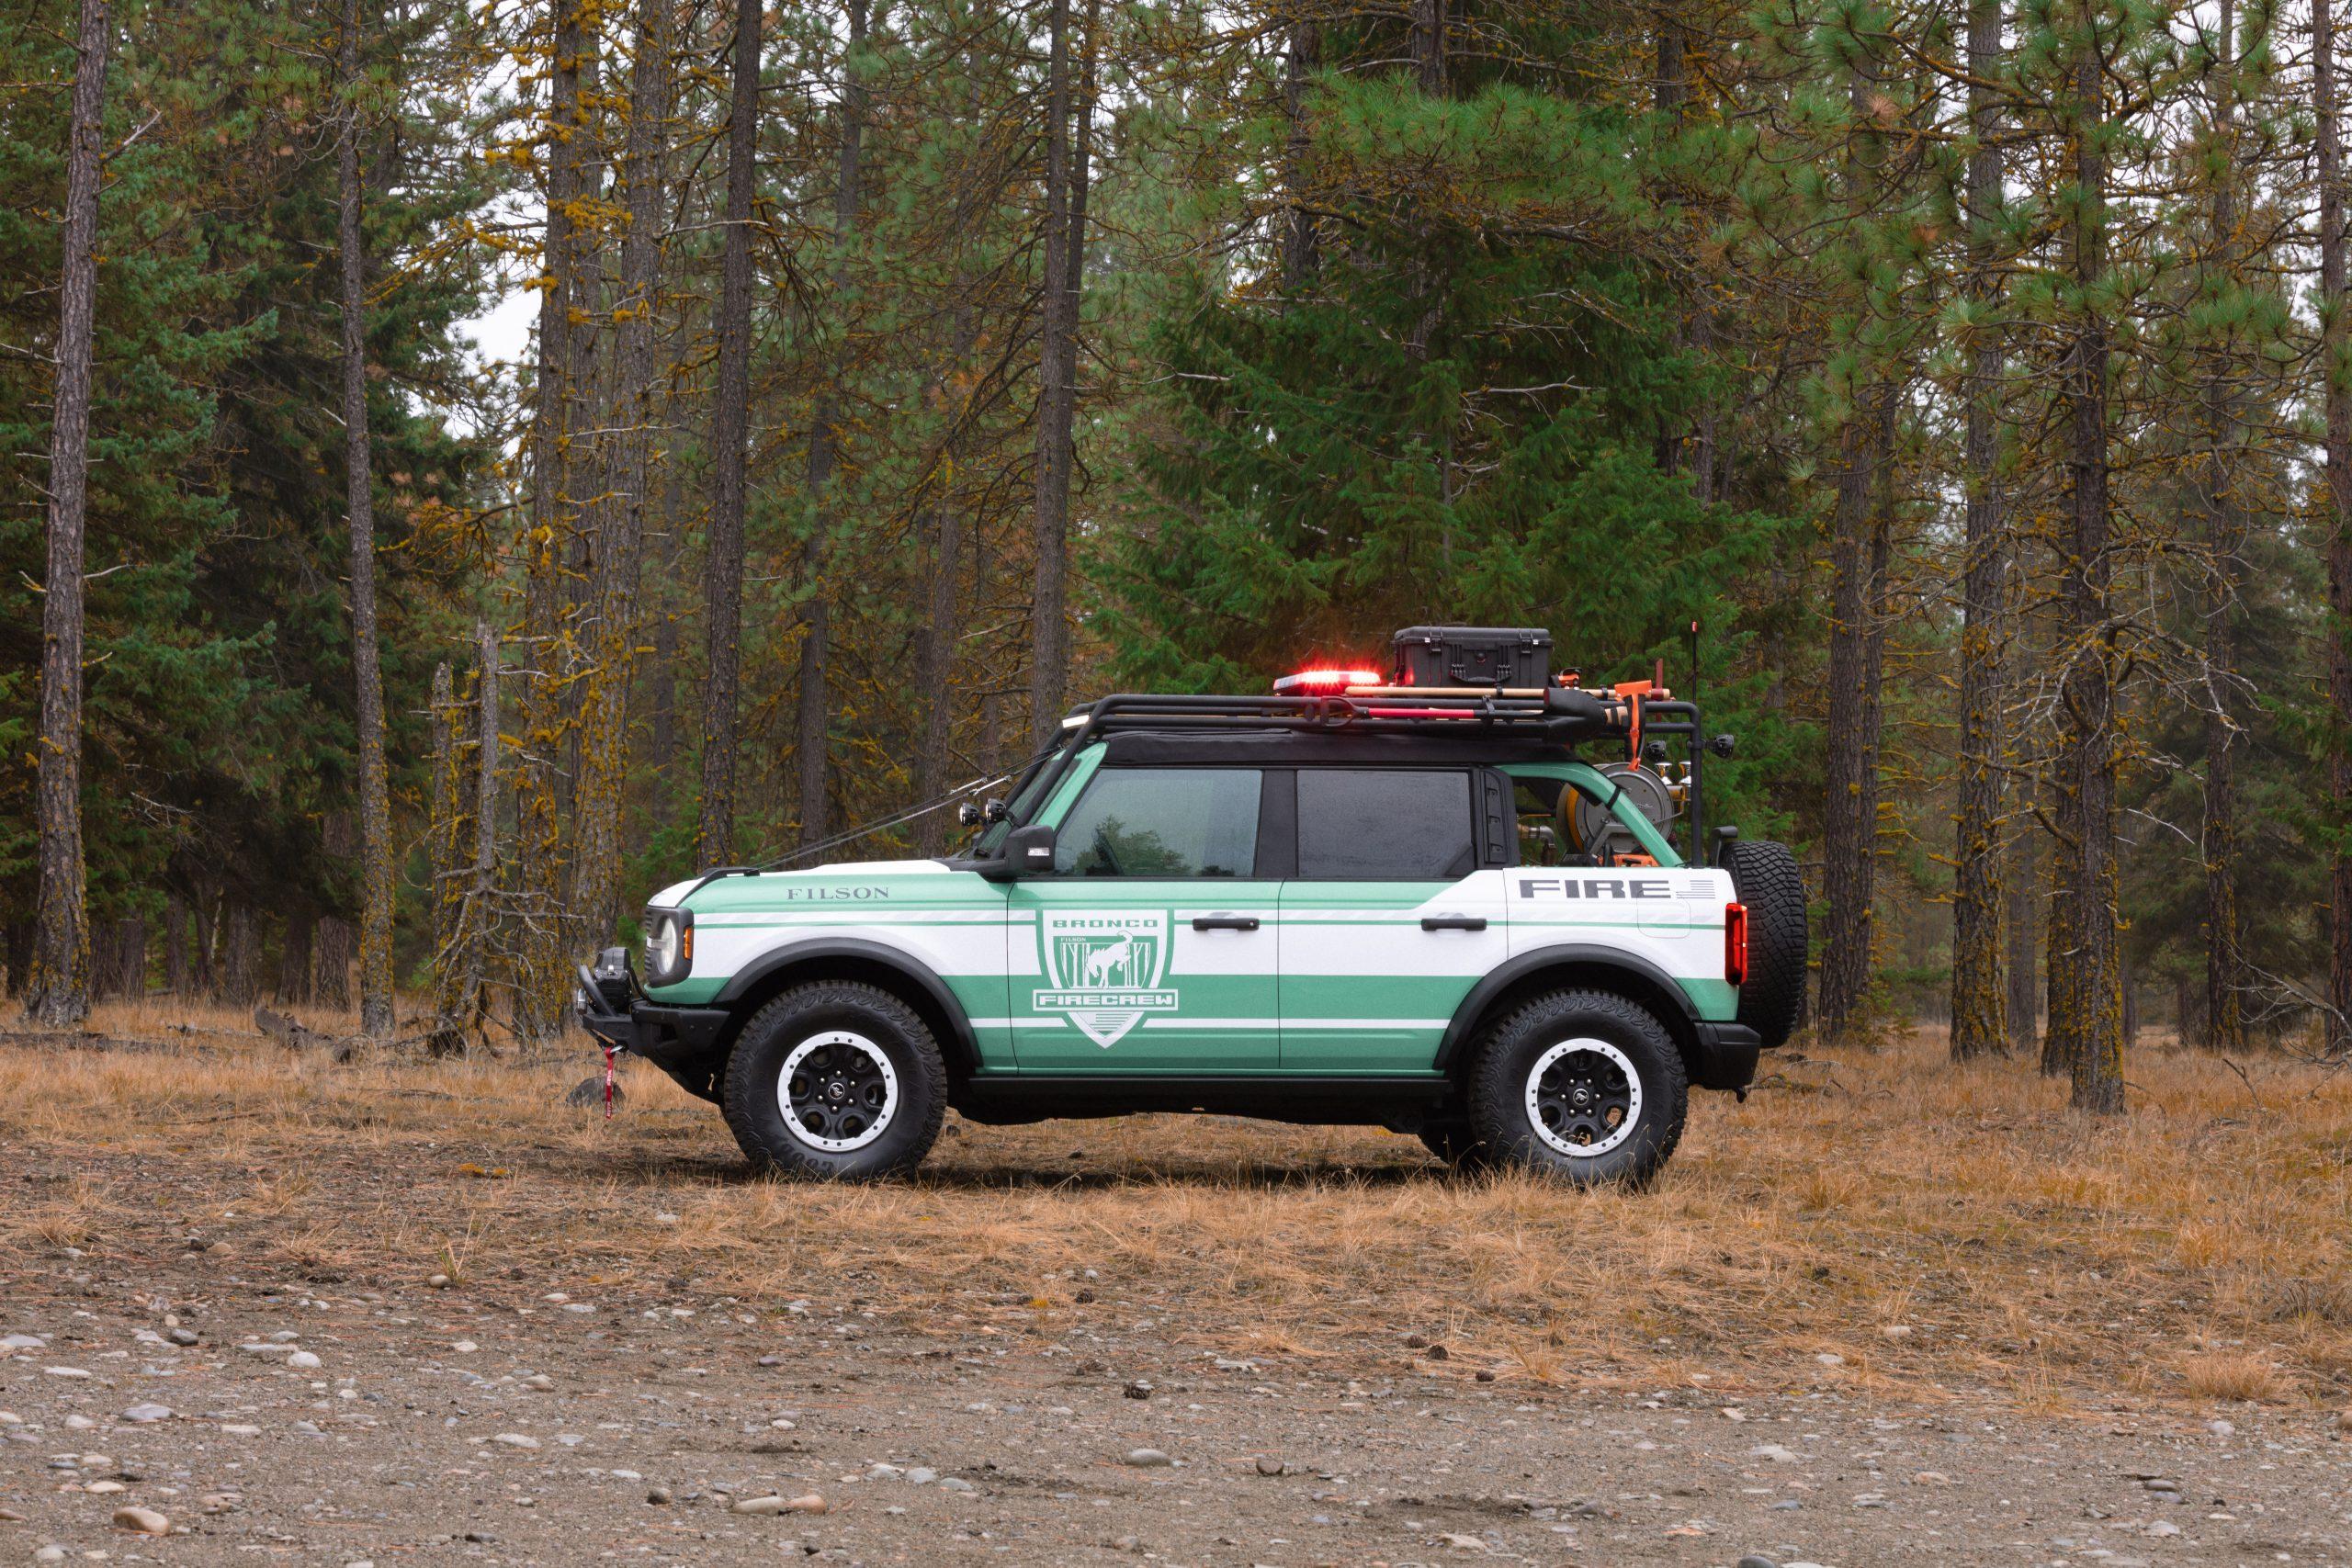 Bronco + Filson Wildland Fire Rig Concept side profile lights on